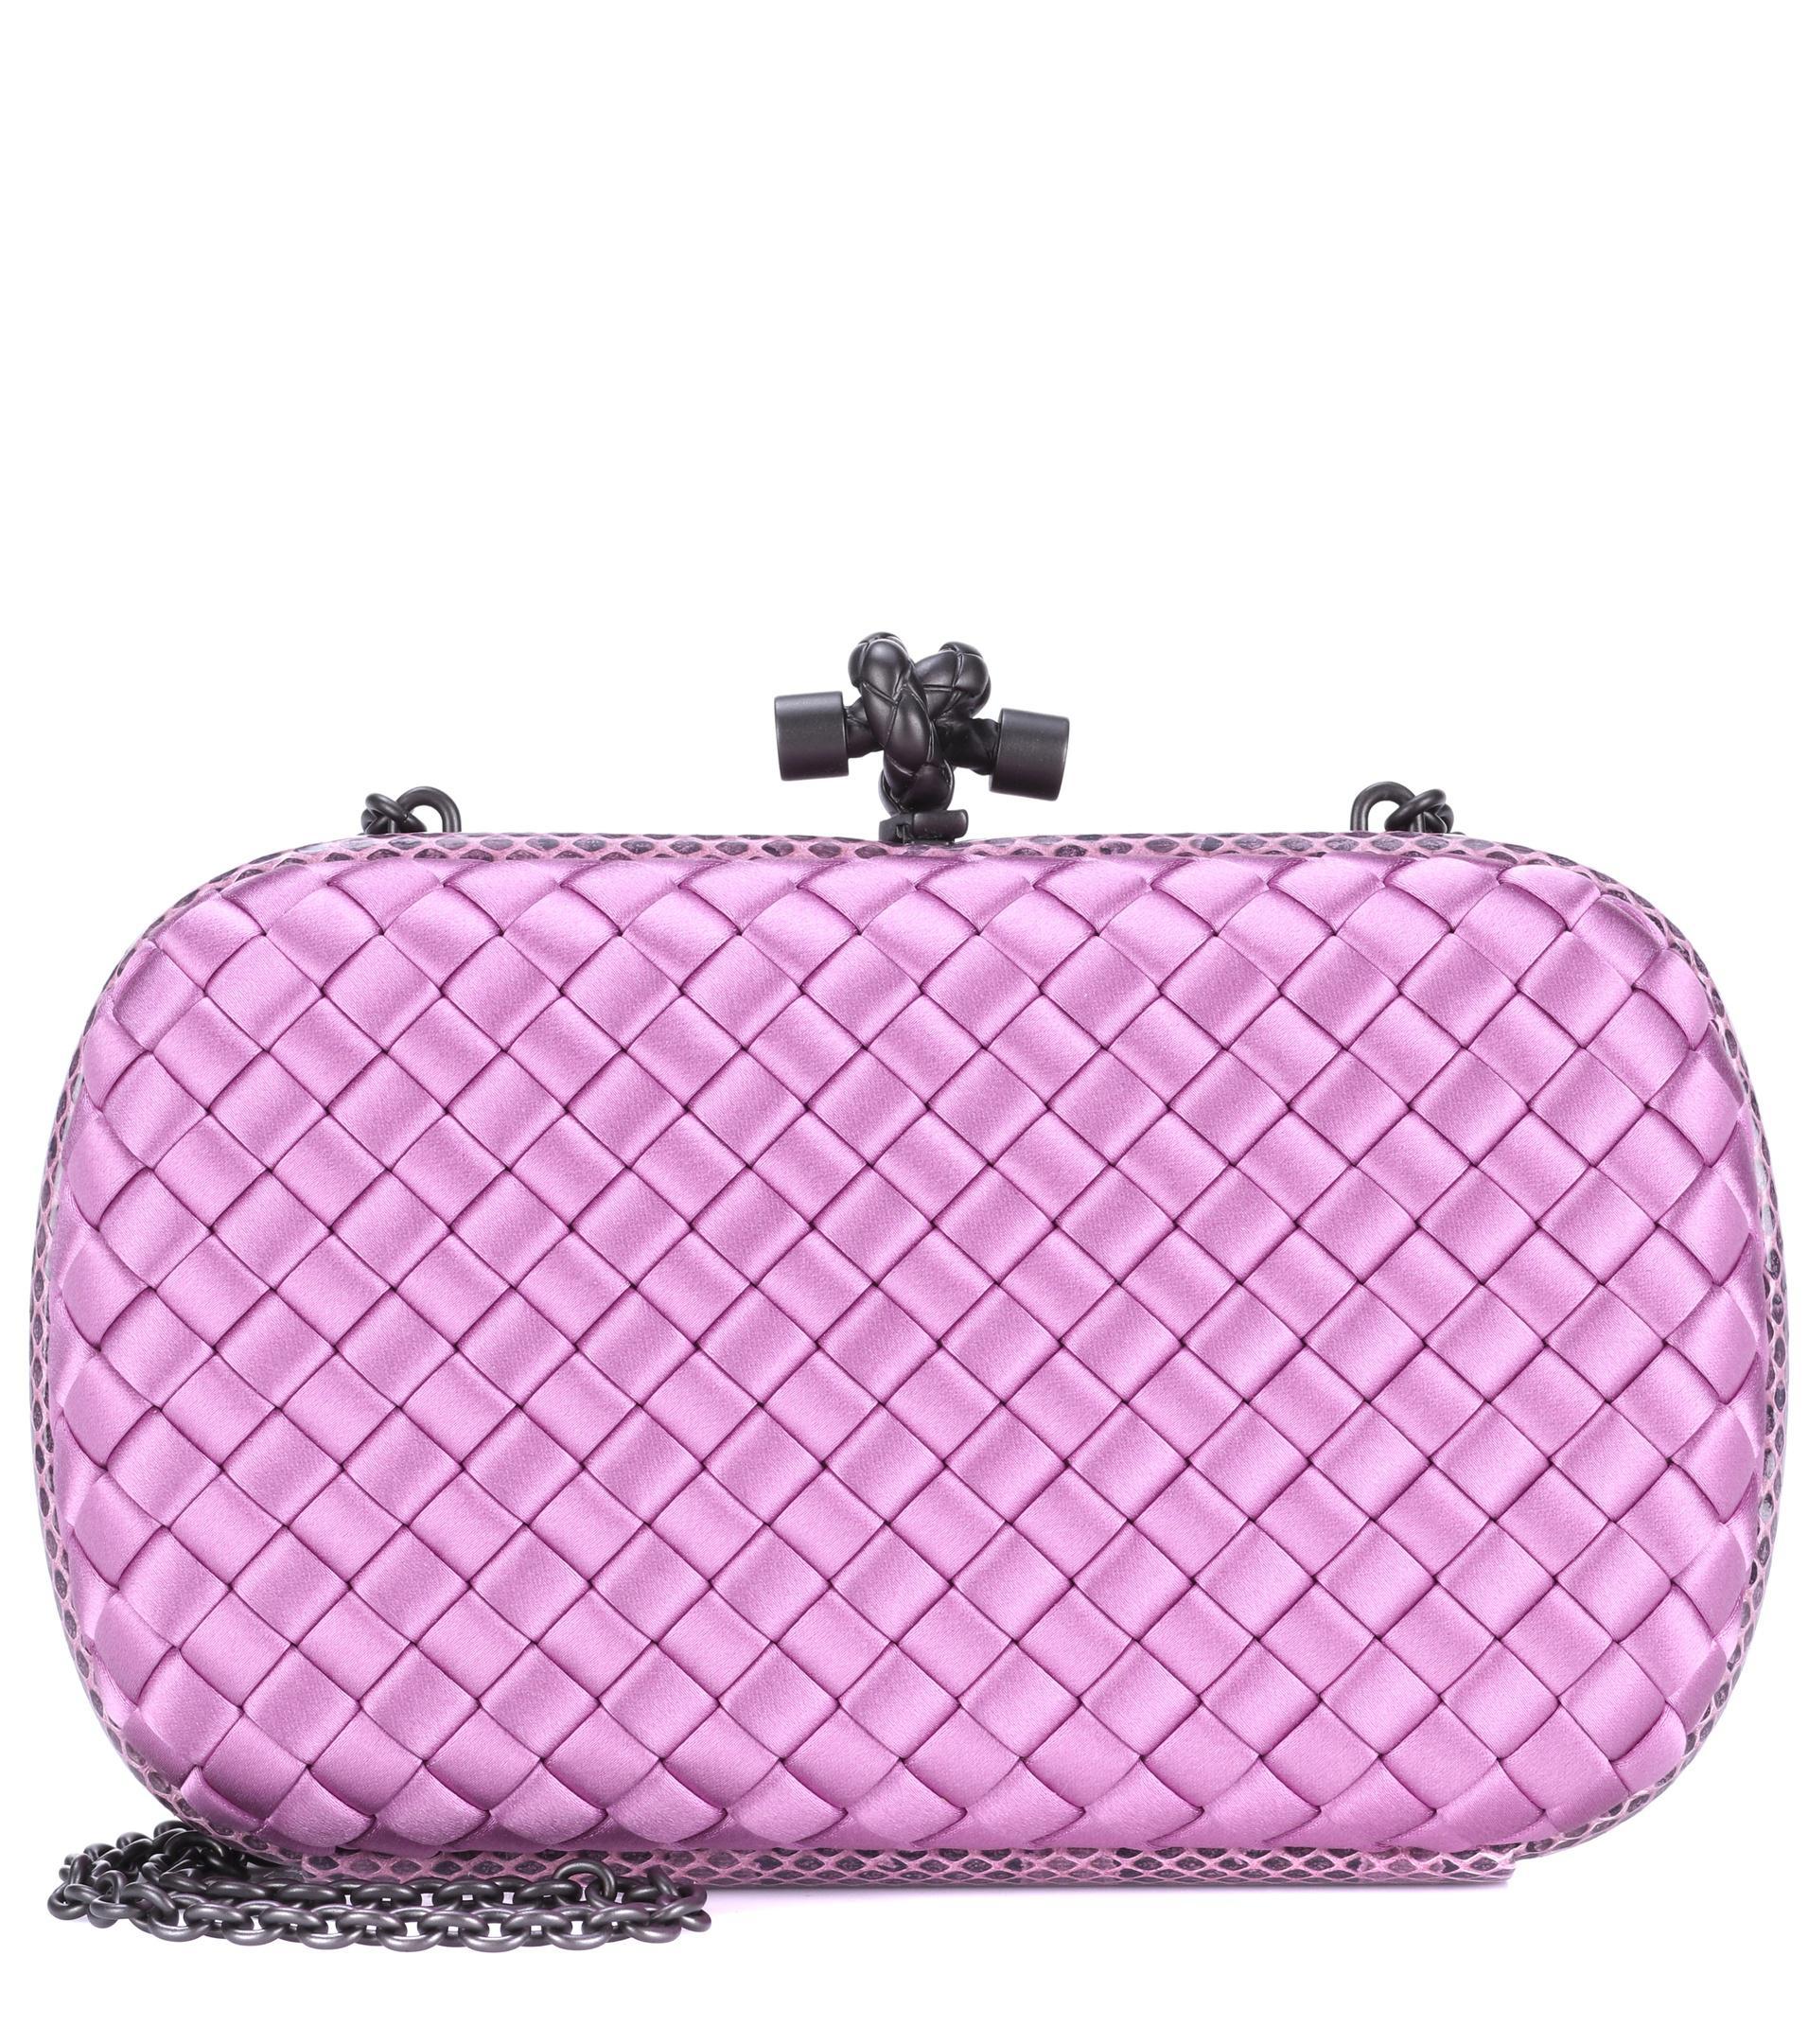 303feece6d4 Bottega Veneta Knot Snakeskin-trimmed Satin Clutch in Pink - Lyst